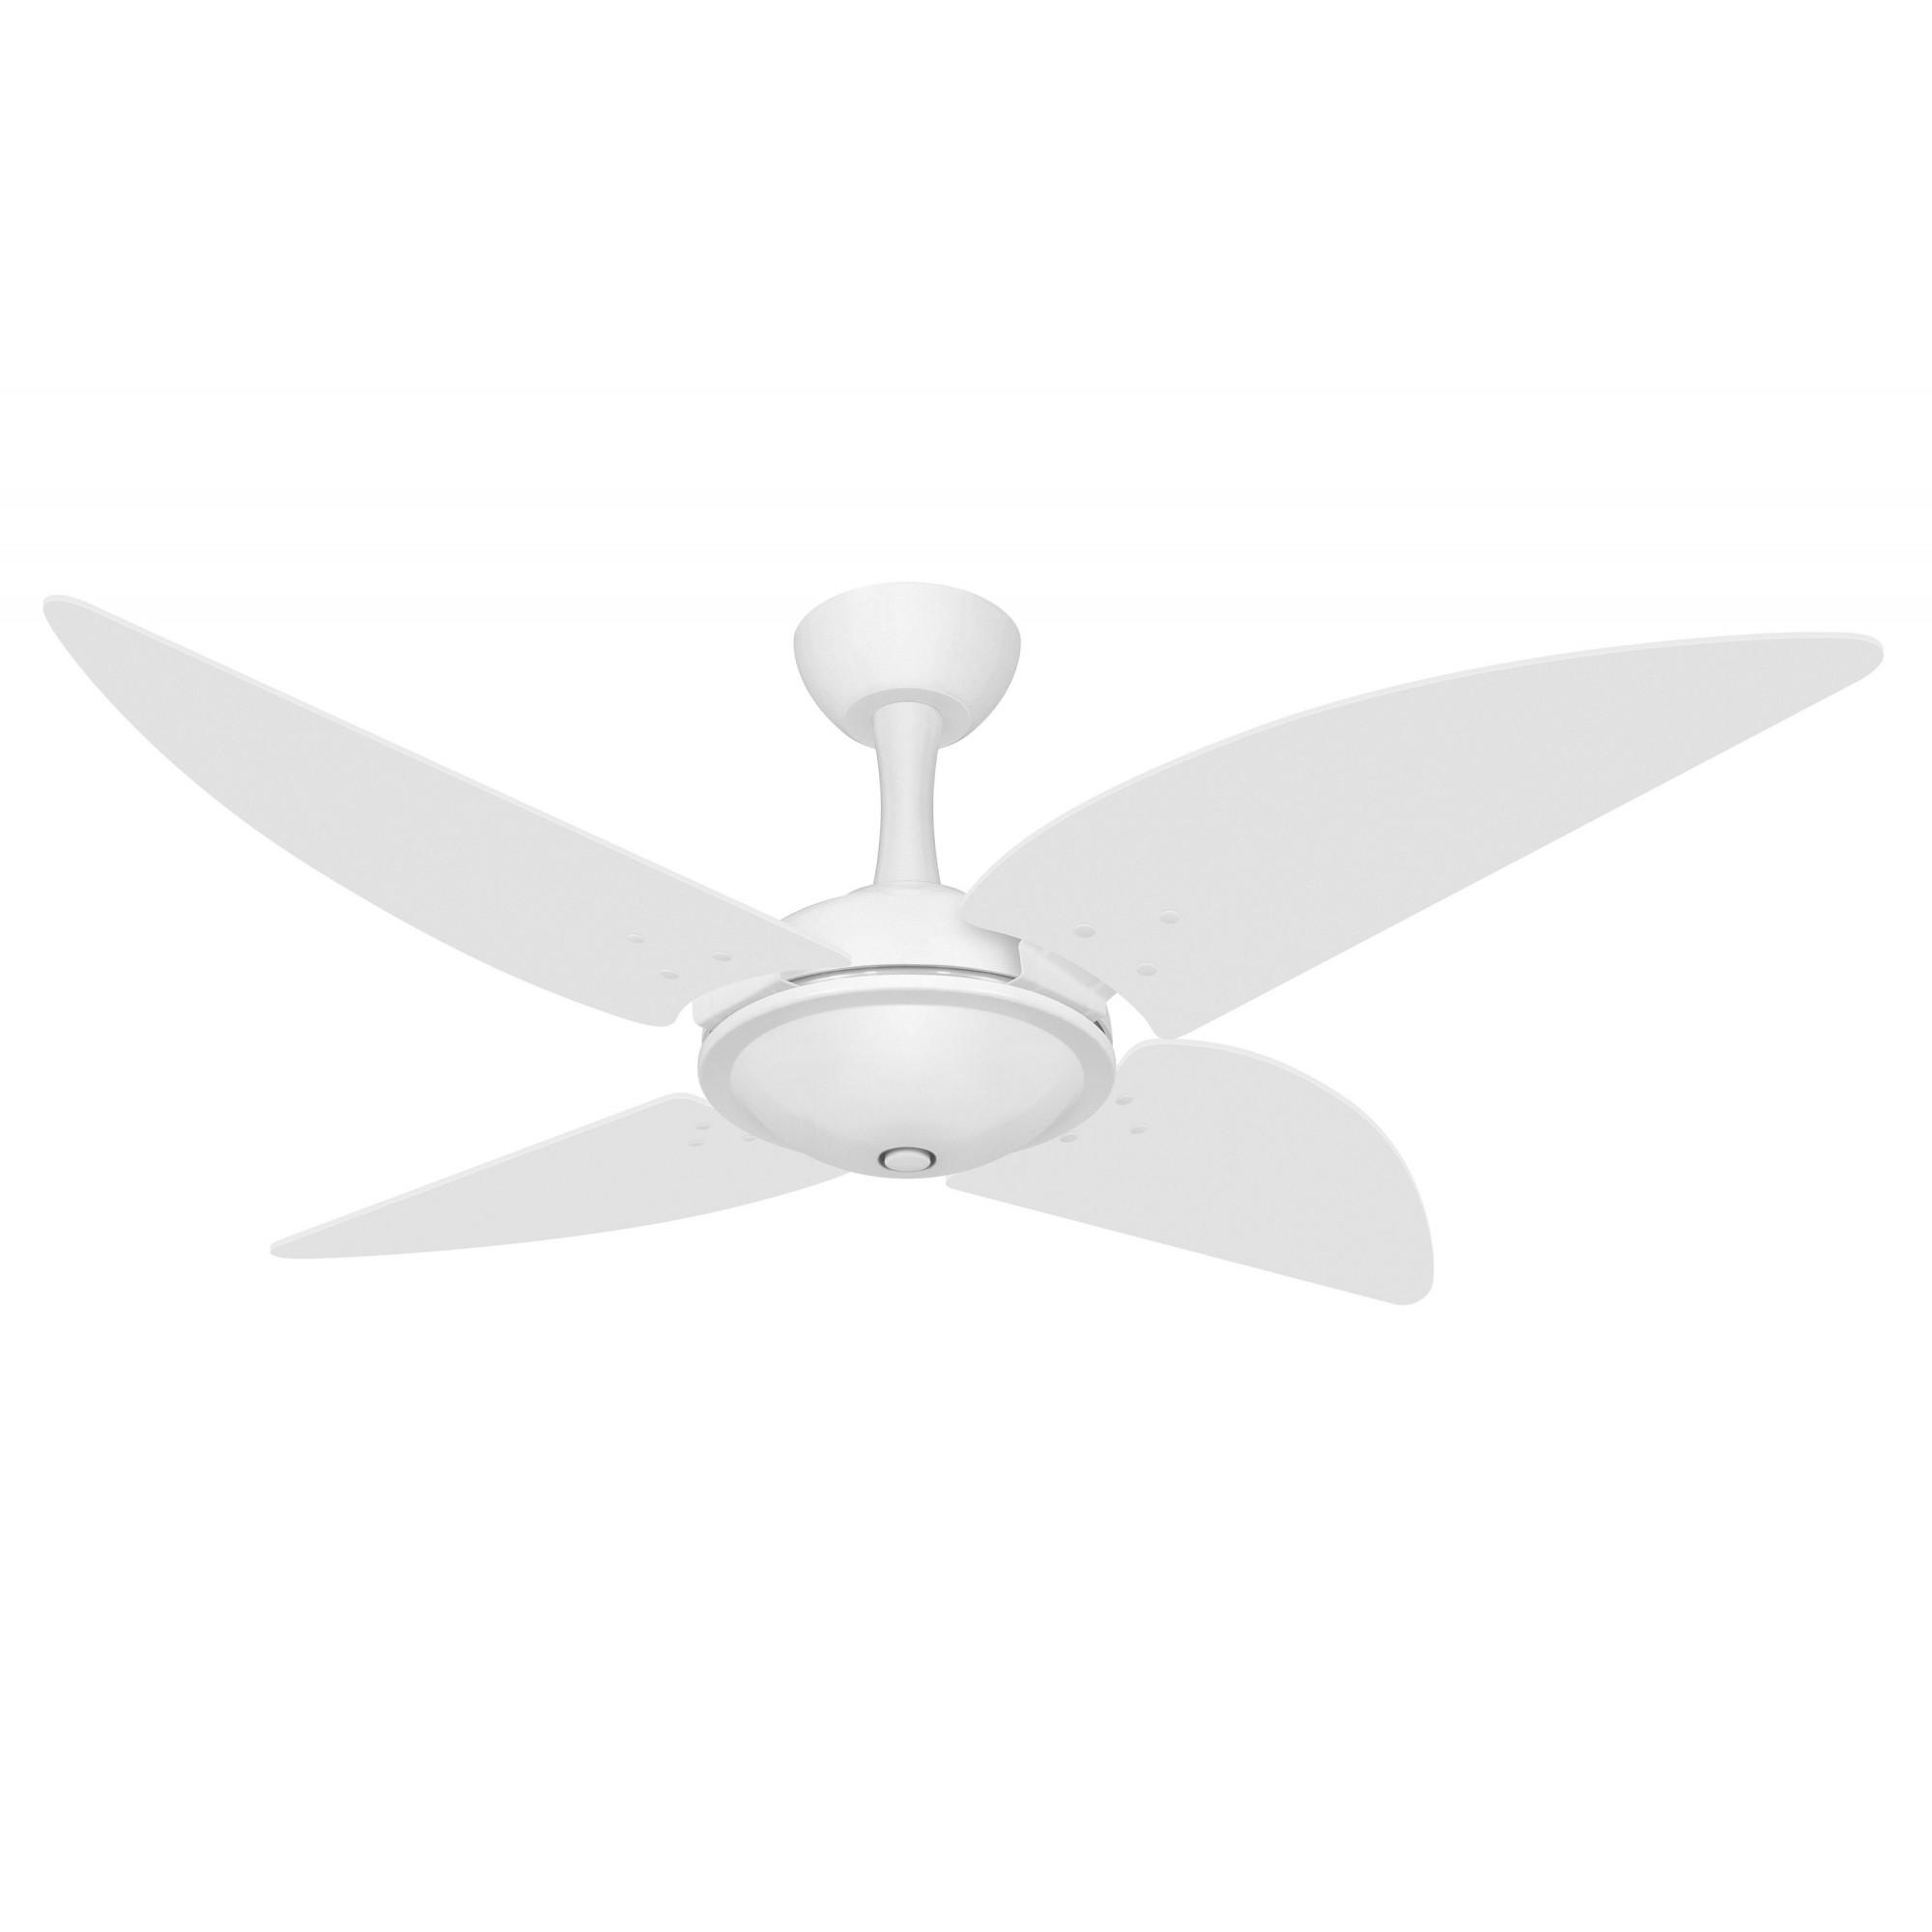 Ventilador Teto Ventax Office Branco 4Pás 220V+Controle Rem.